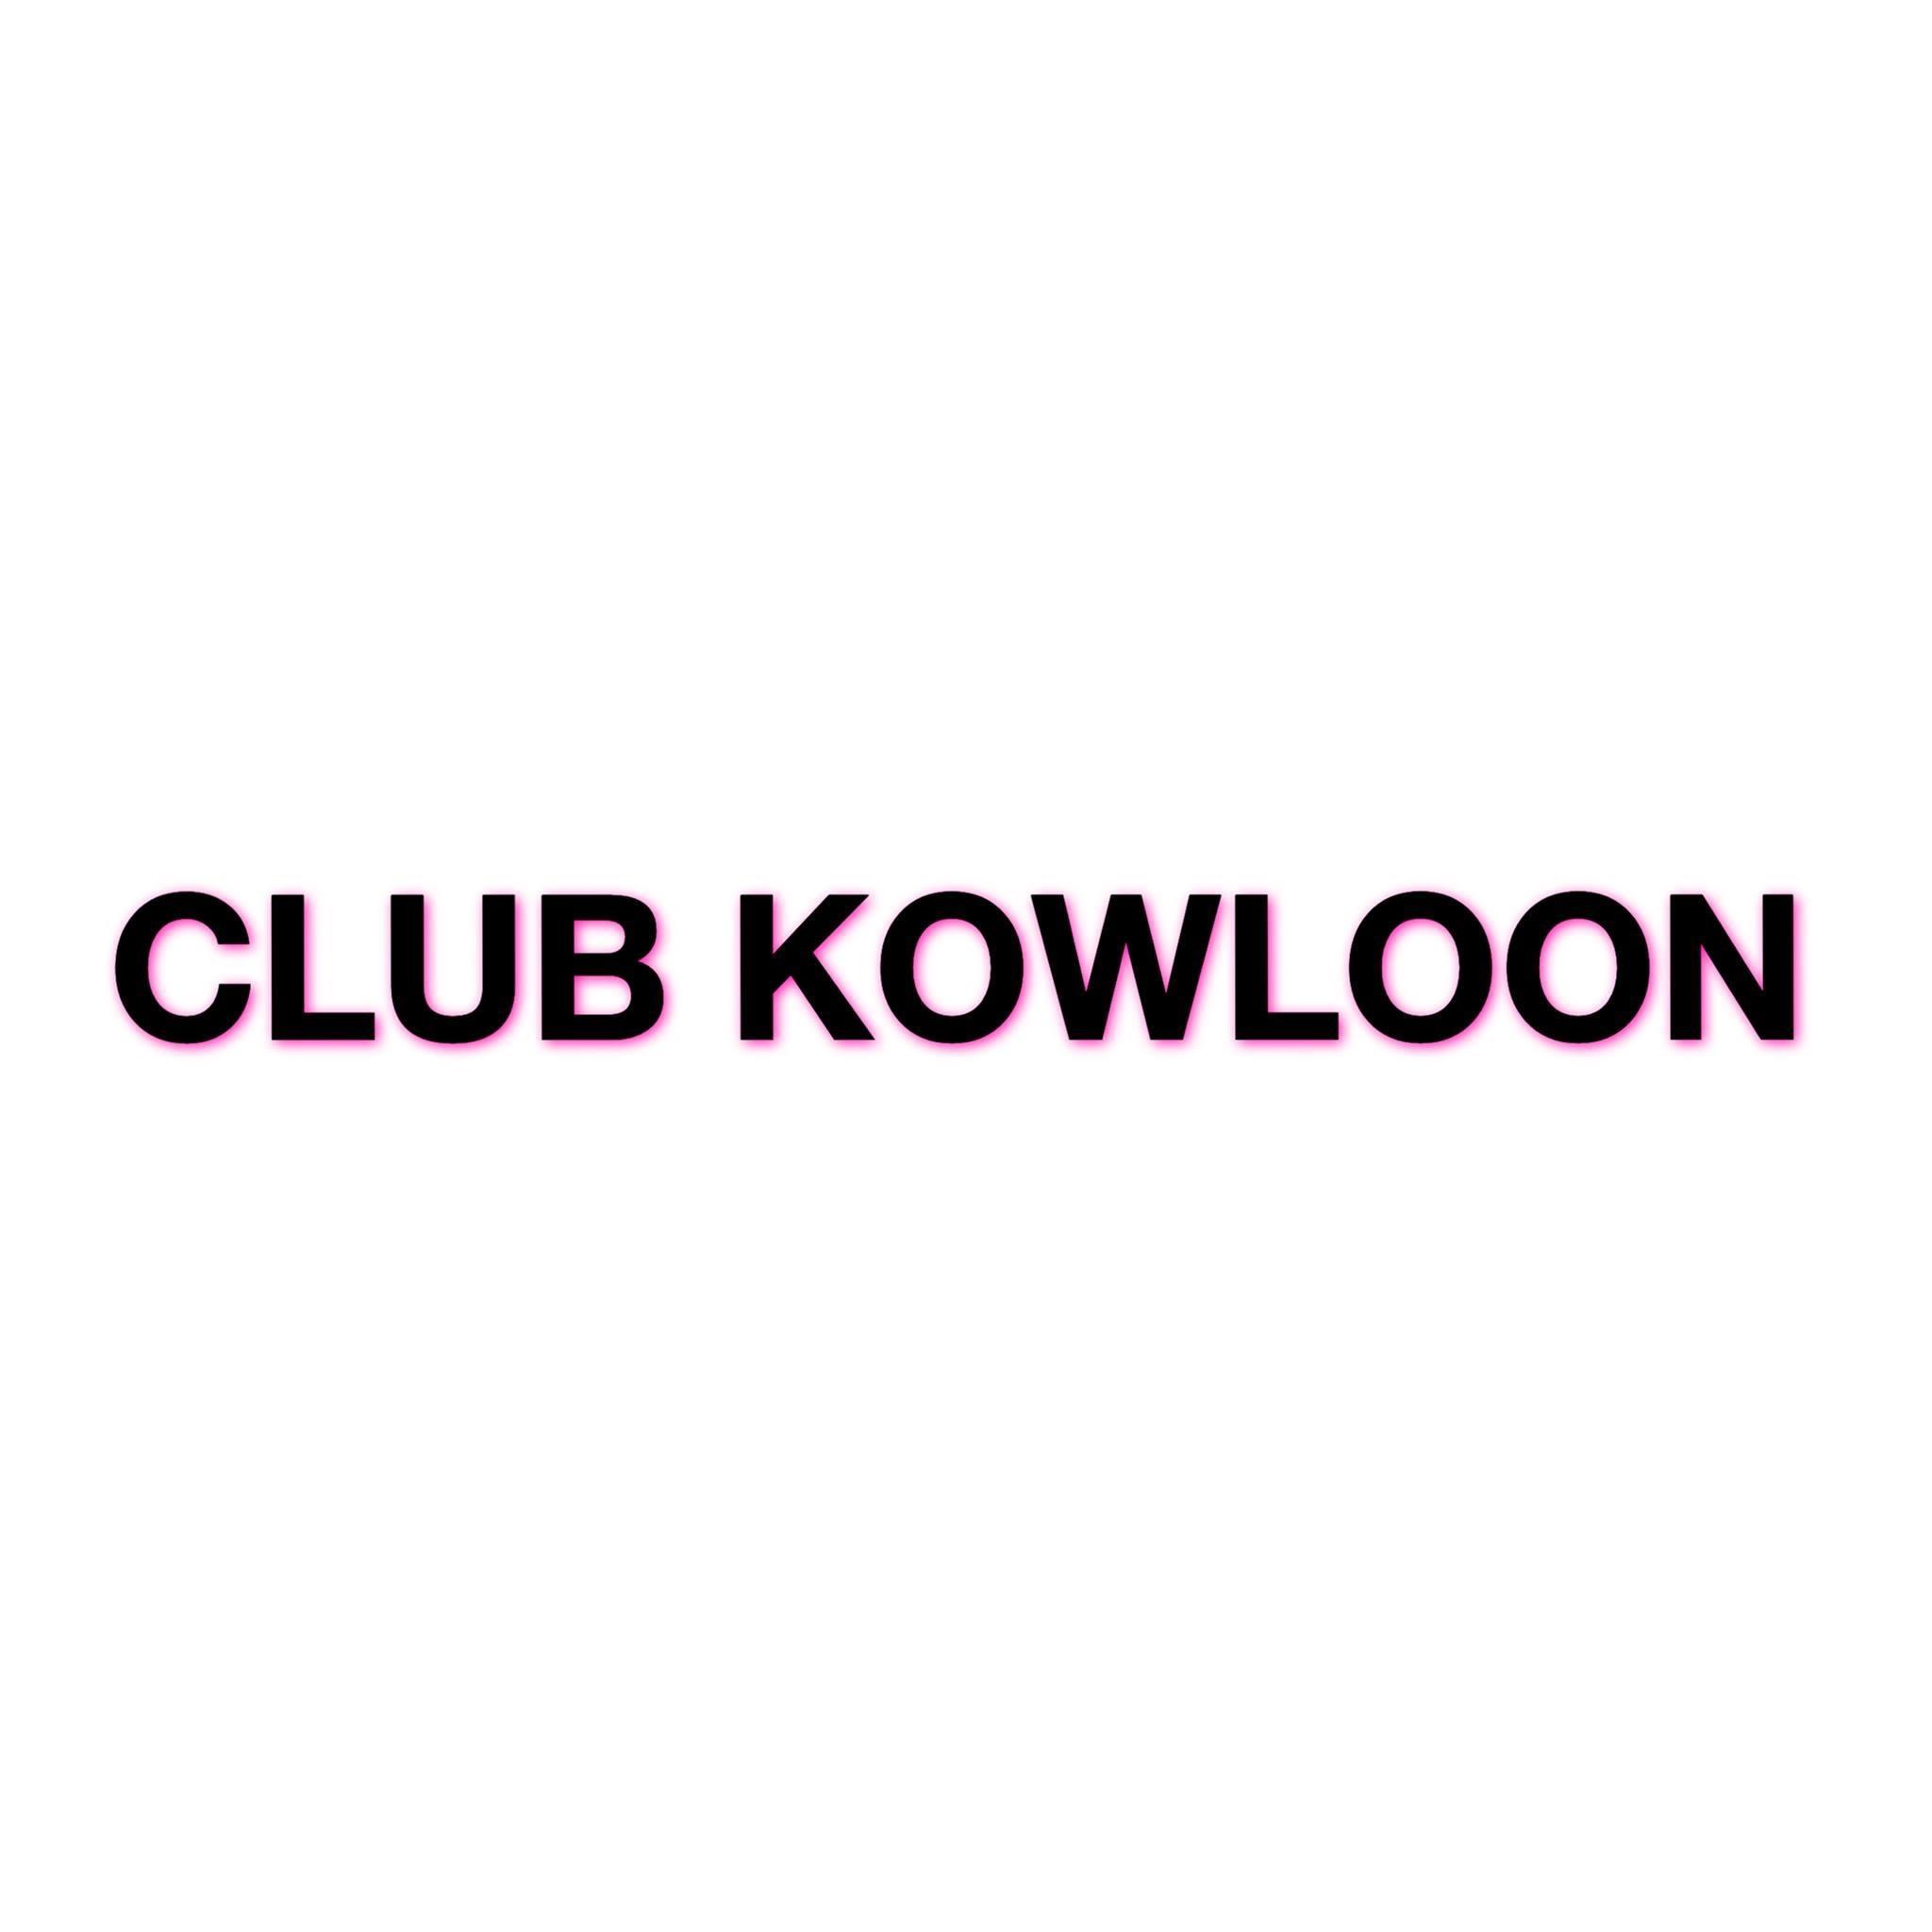 Club Kowloon